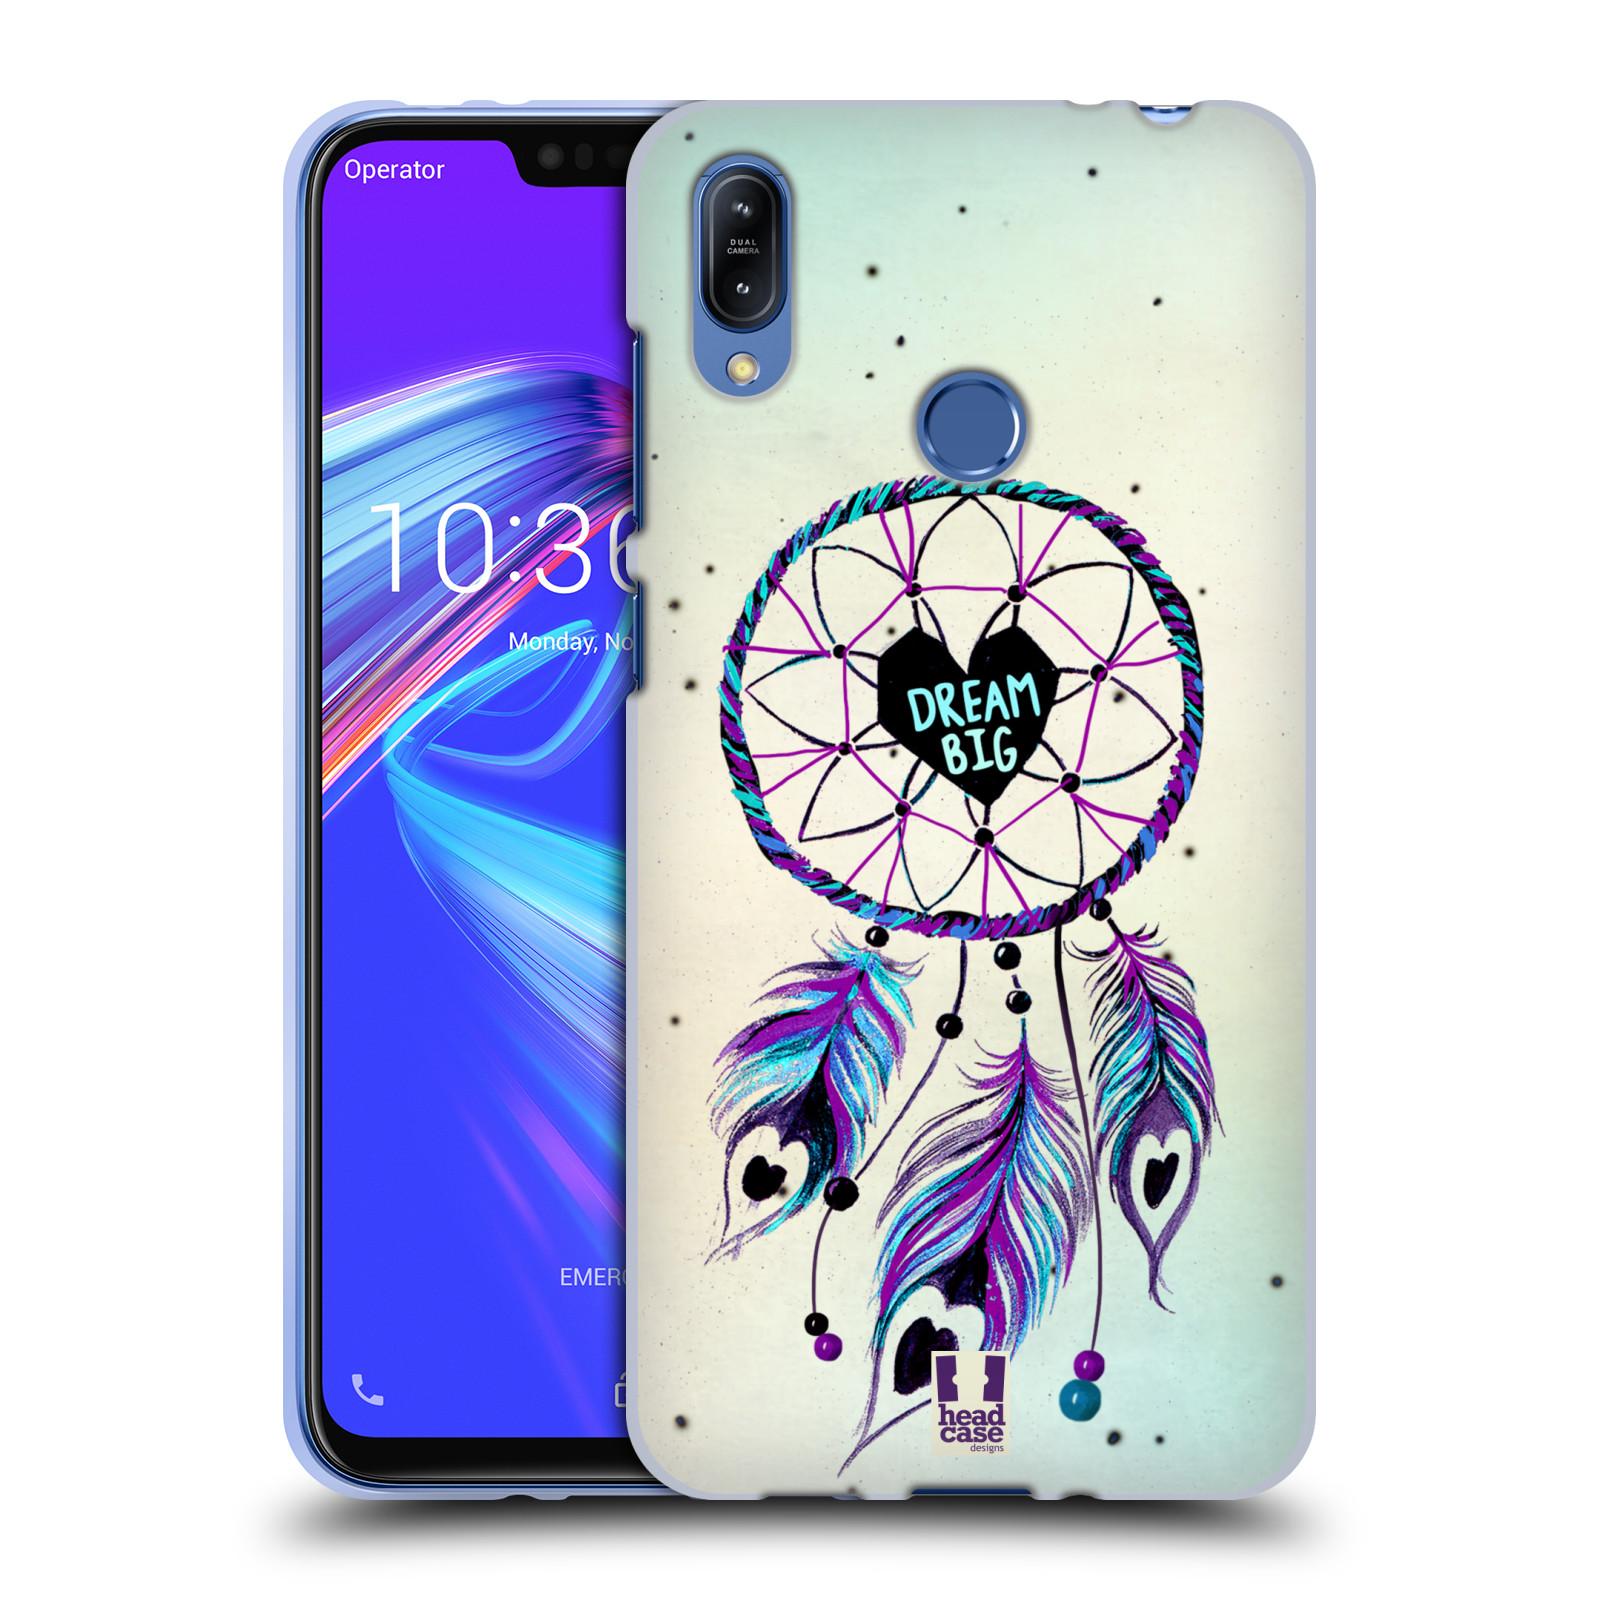 Silikonové pouzdro na mobil Asus Zenfone Max (M2) ZB633KL - Head Case - Lapač Assorted Dream Big Srdce